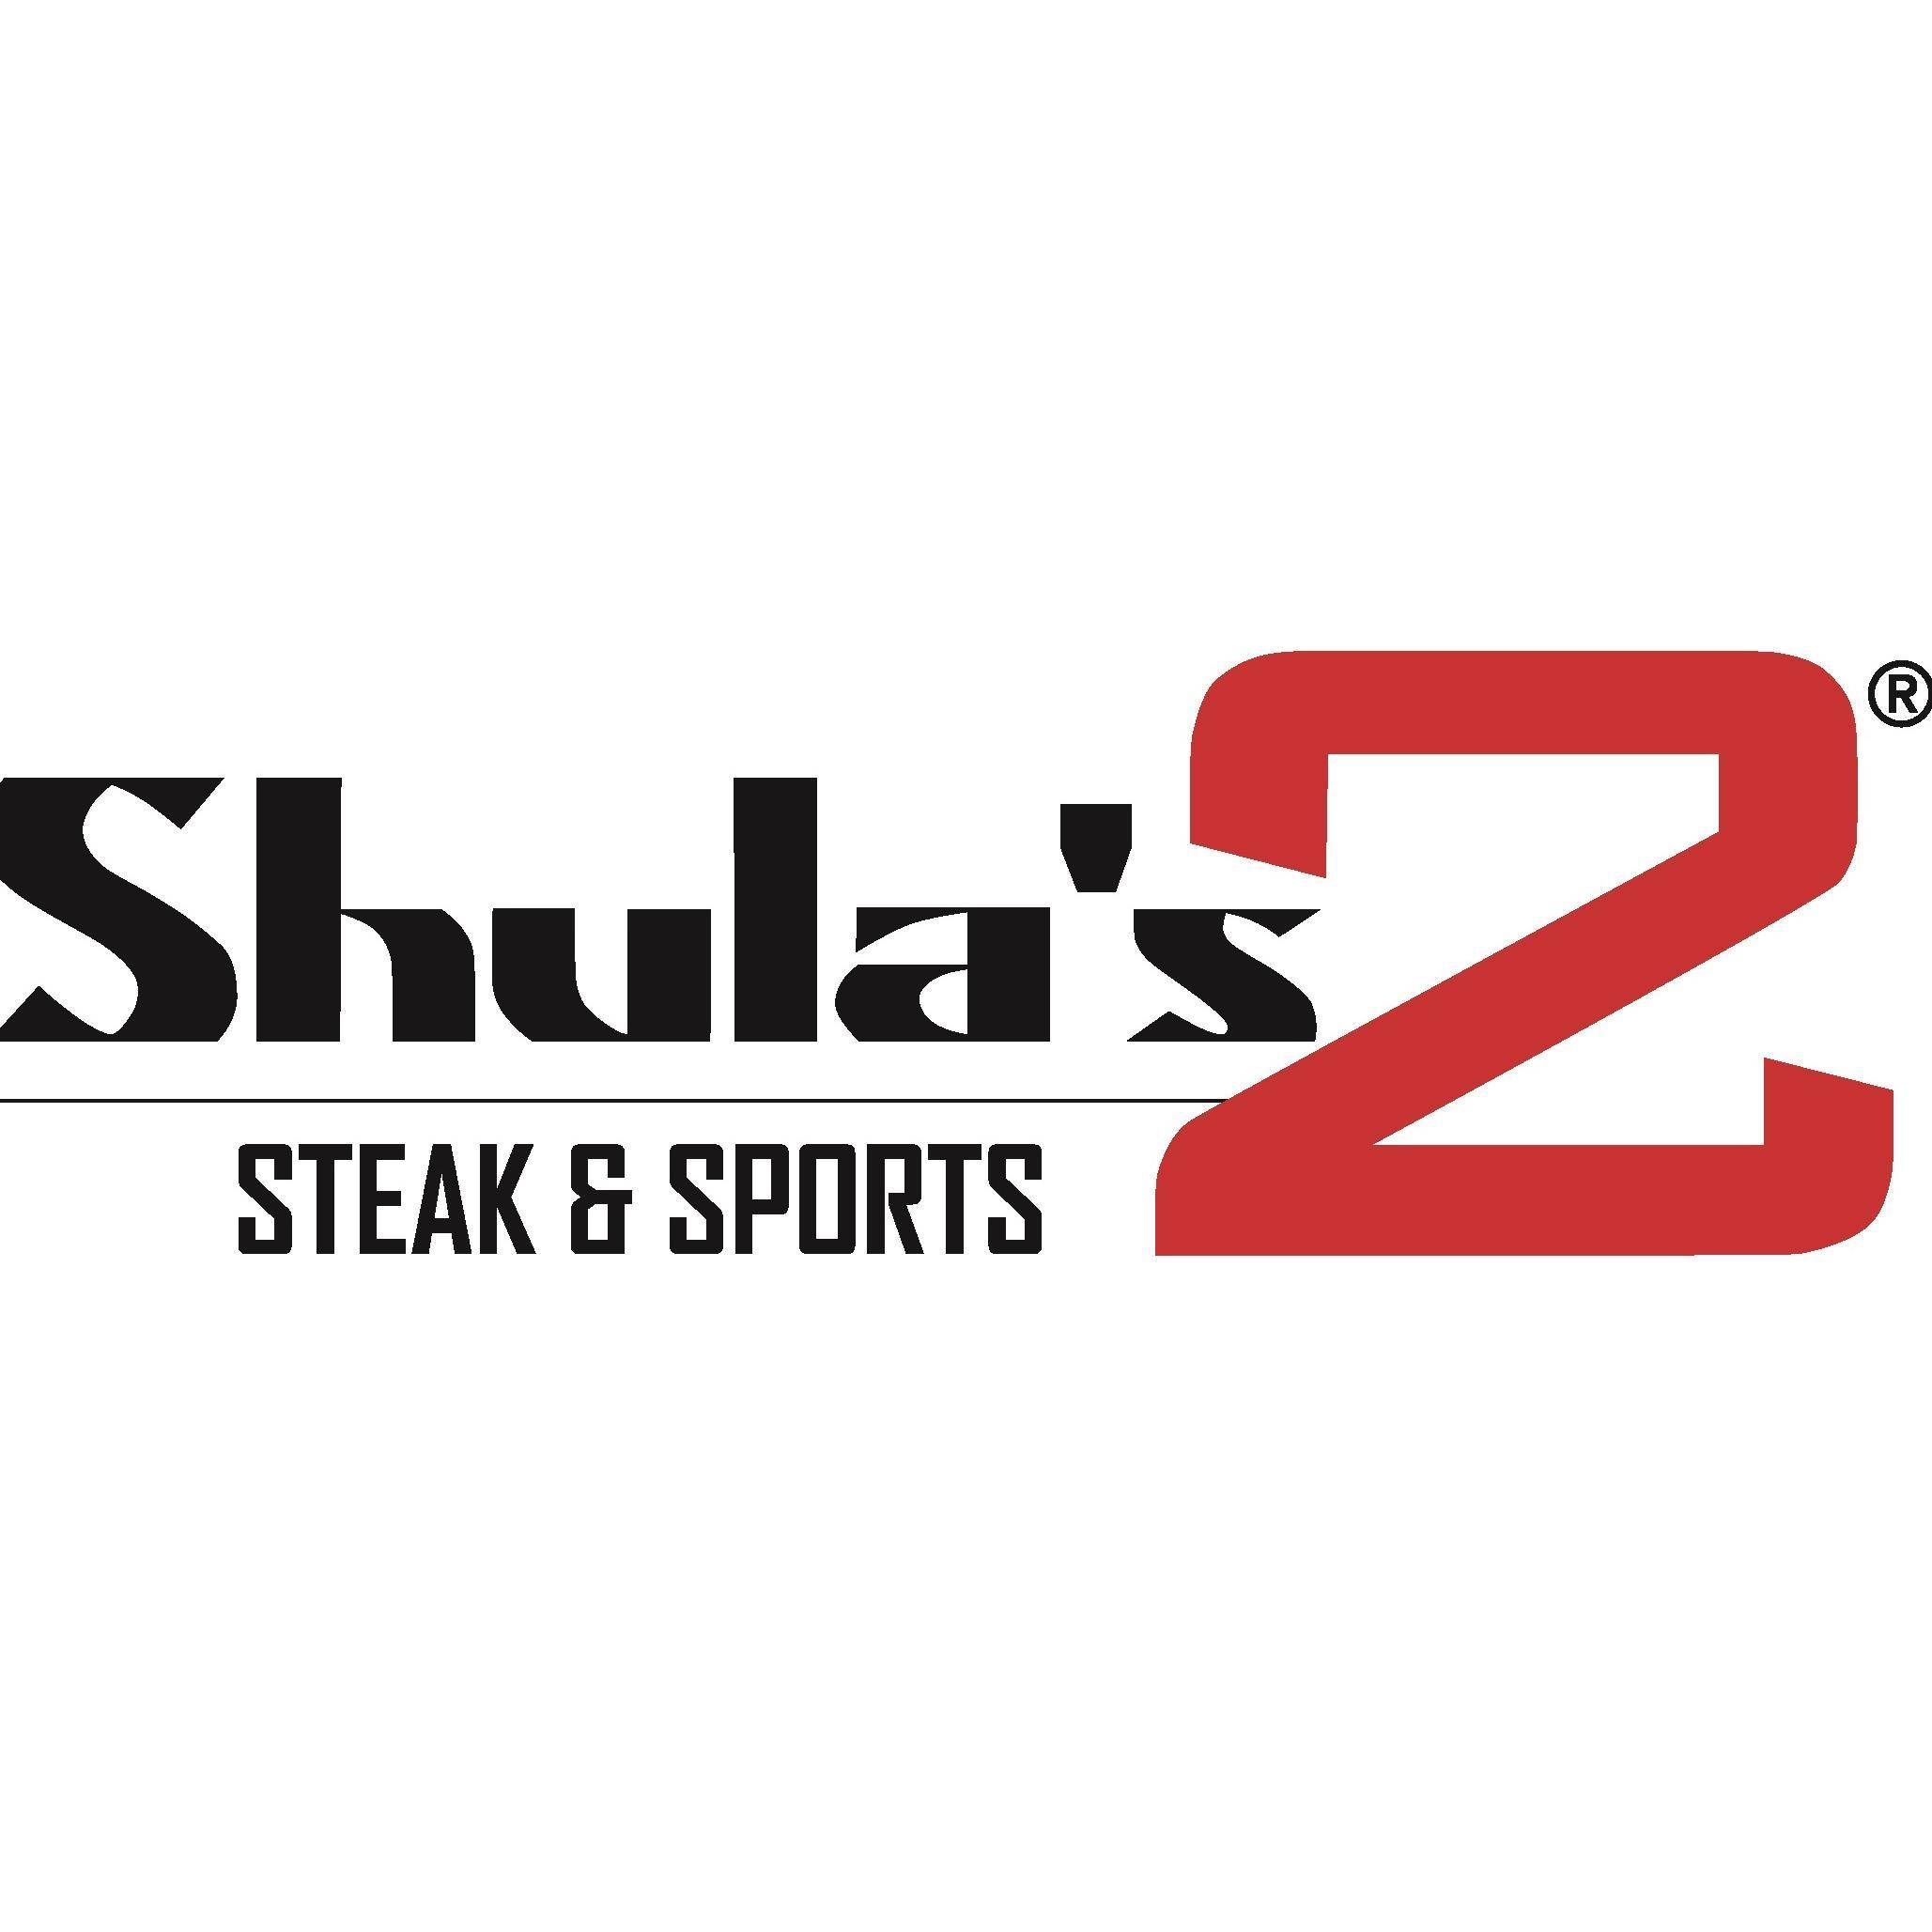 Shula's 2 Steak & Sports in Cleveland, OH, photo #1